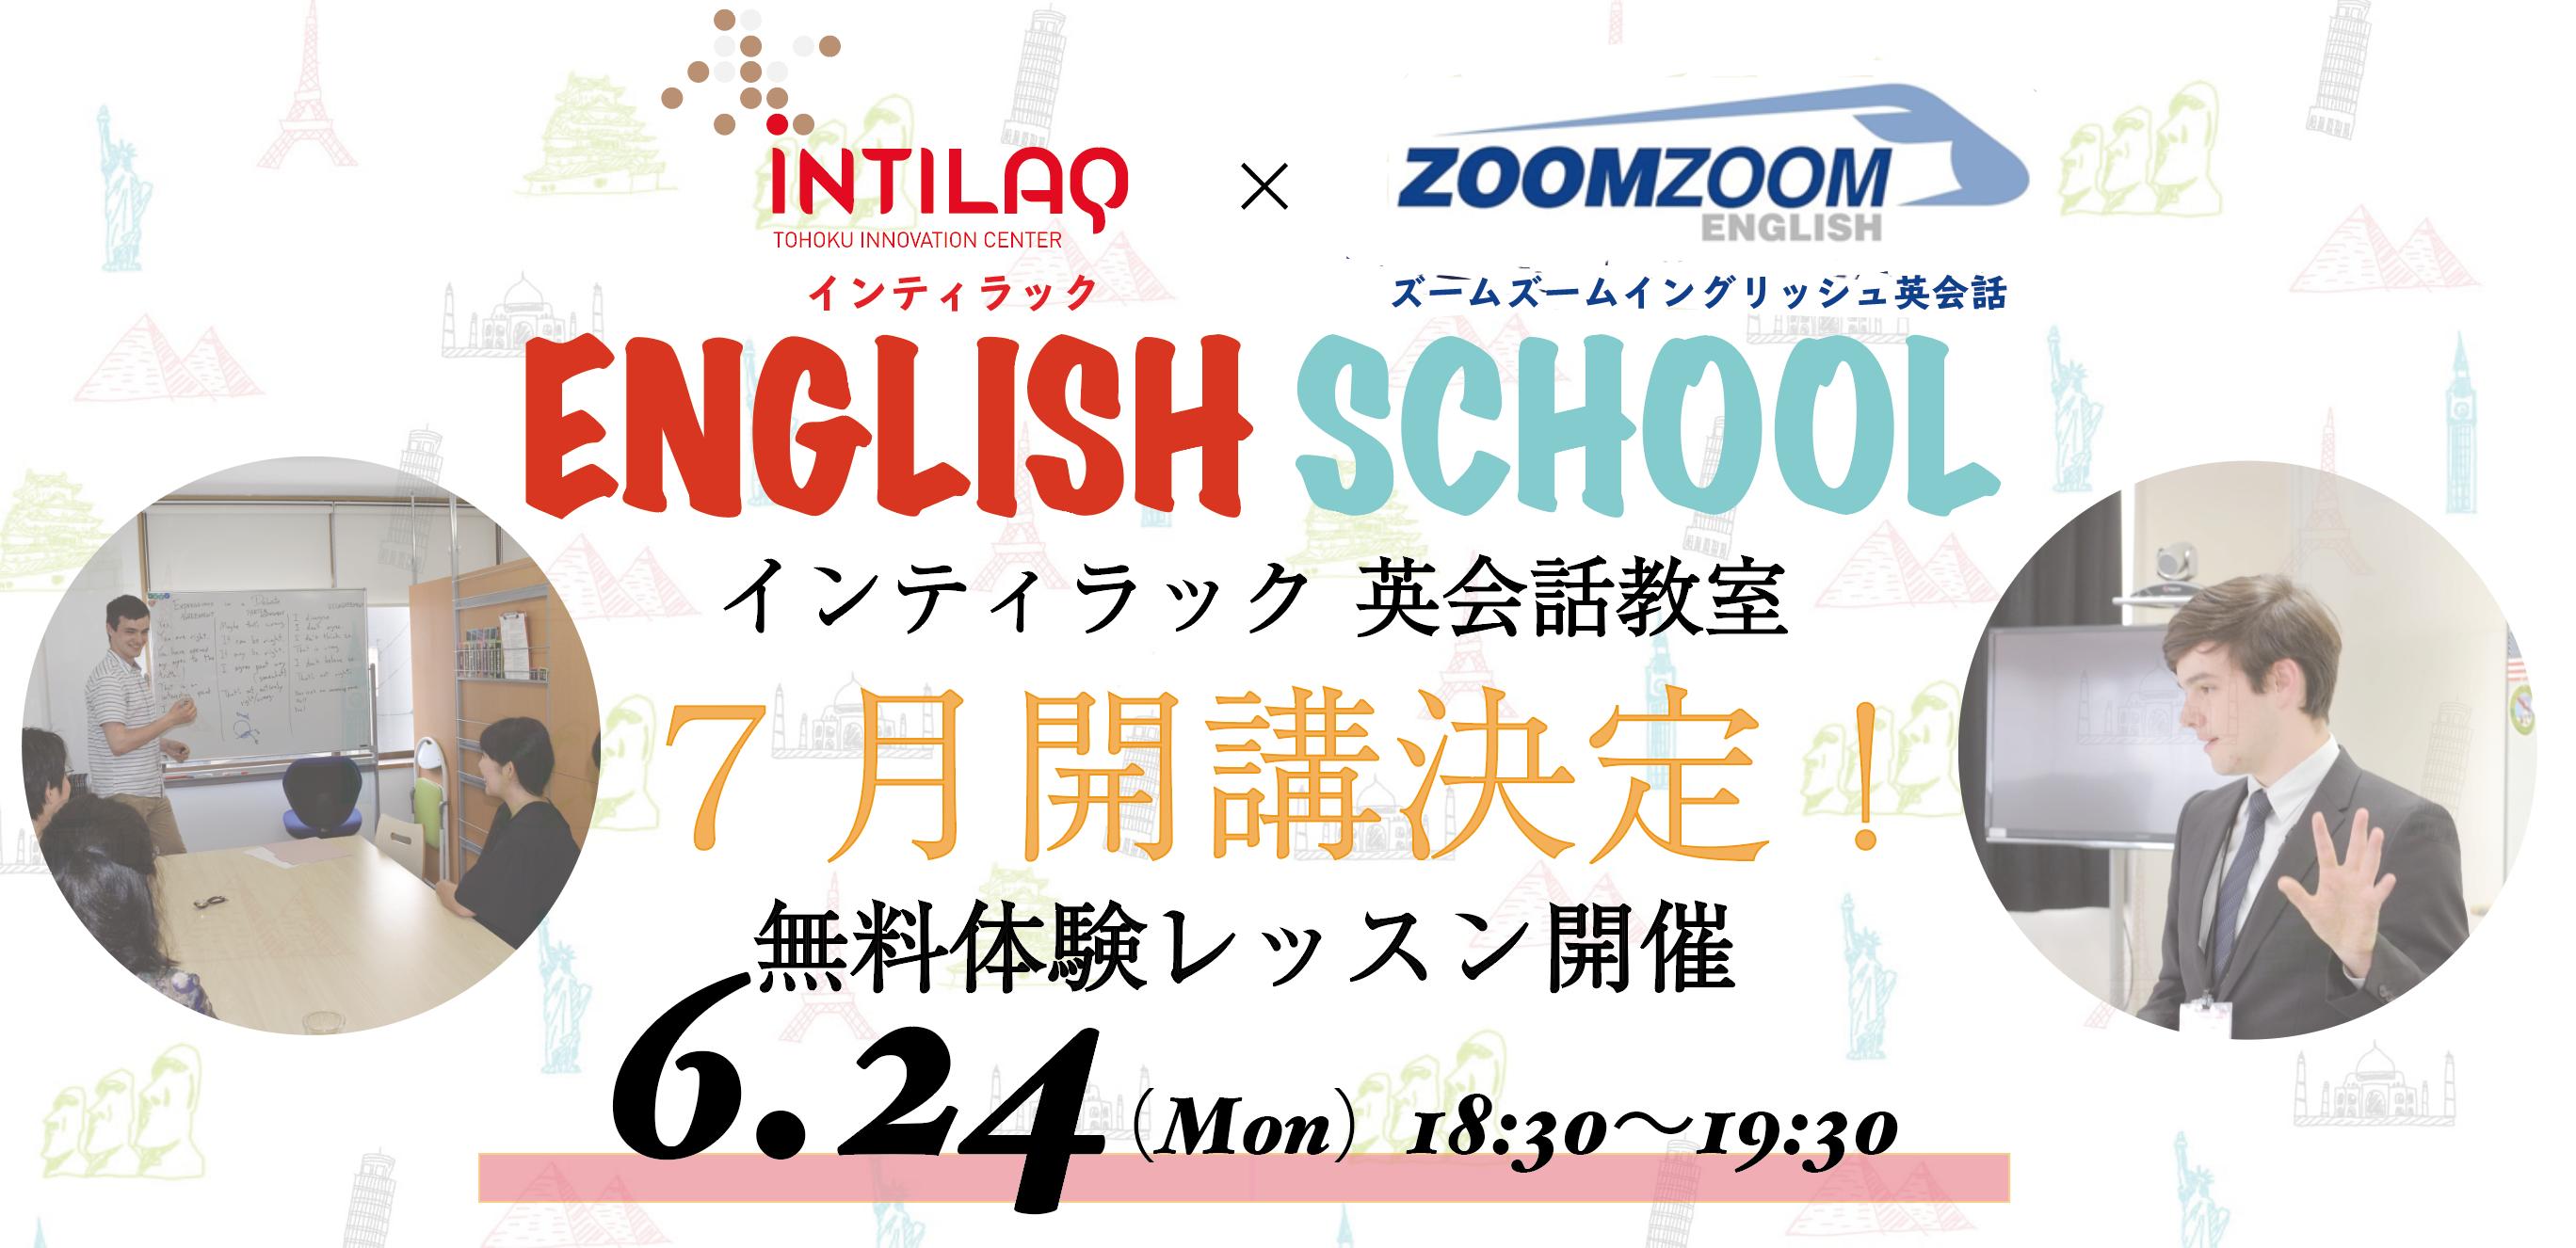 INTILAQ英会話教室・無料体験レッスン